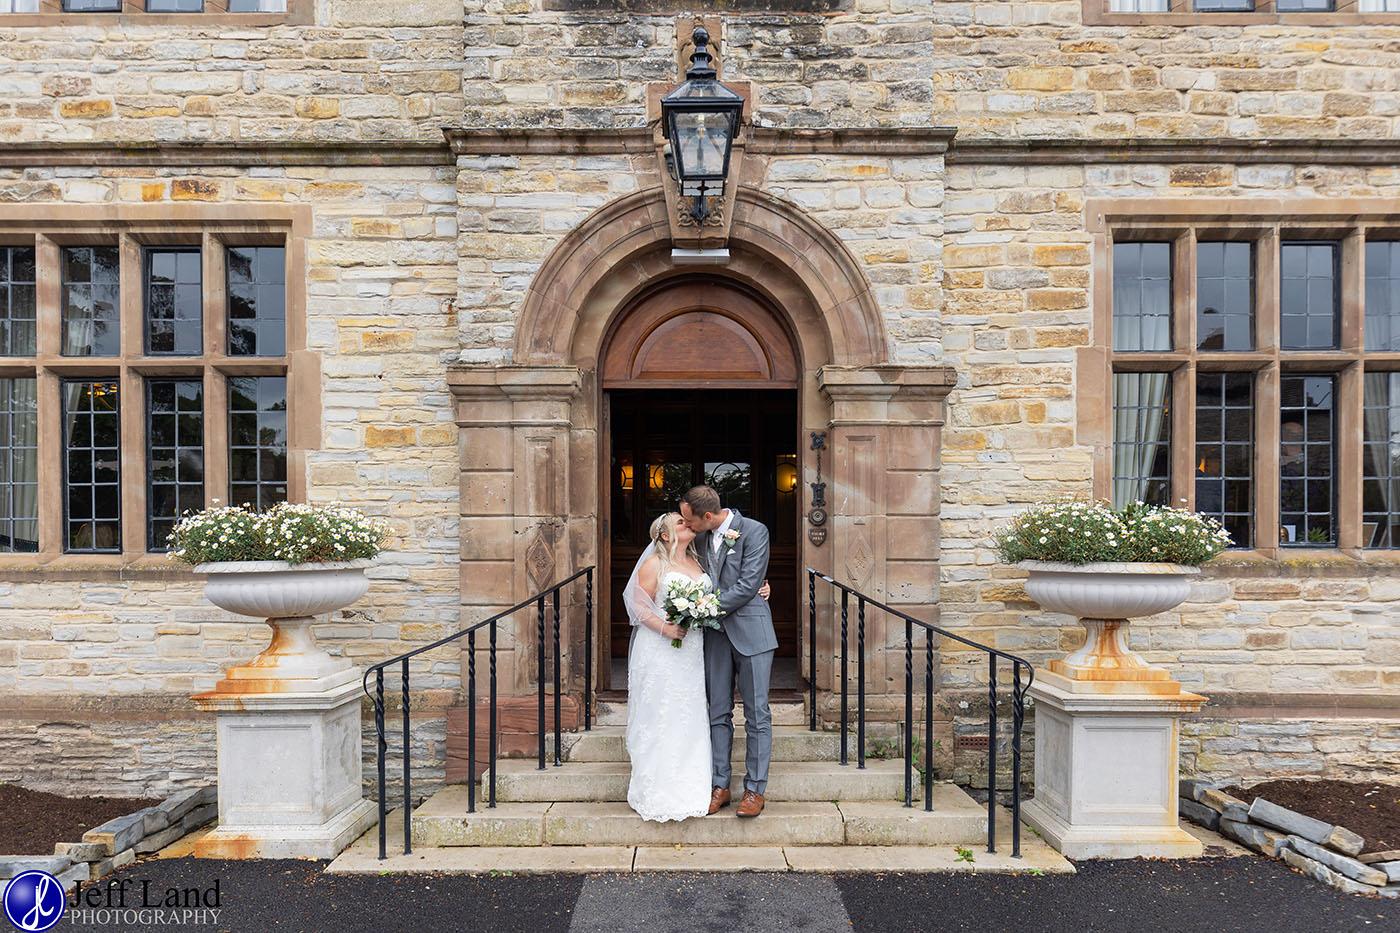 Billesley Manor Bridal Photo